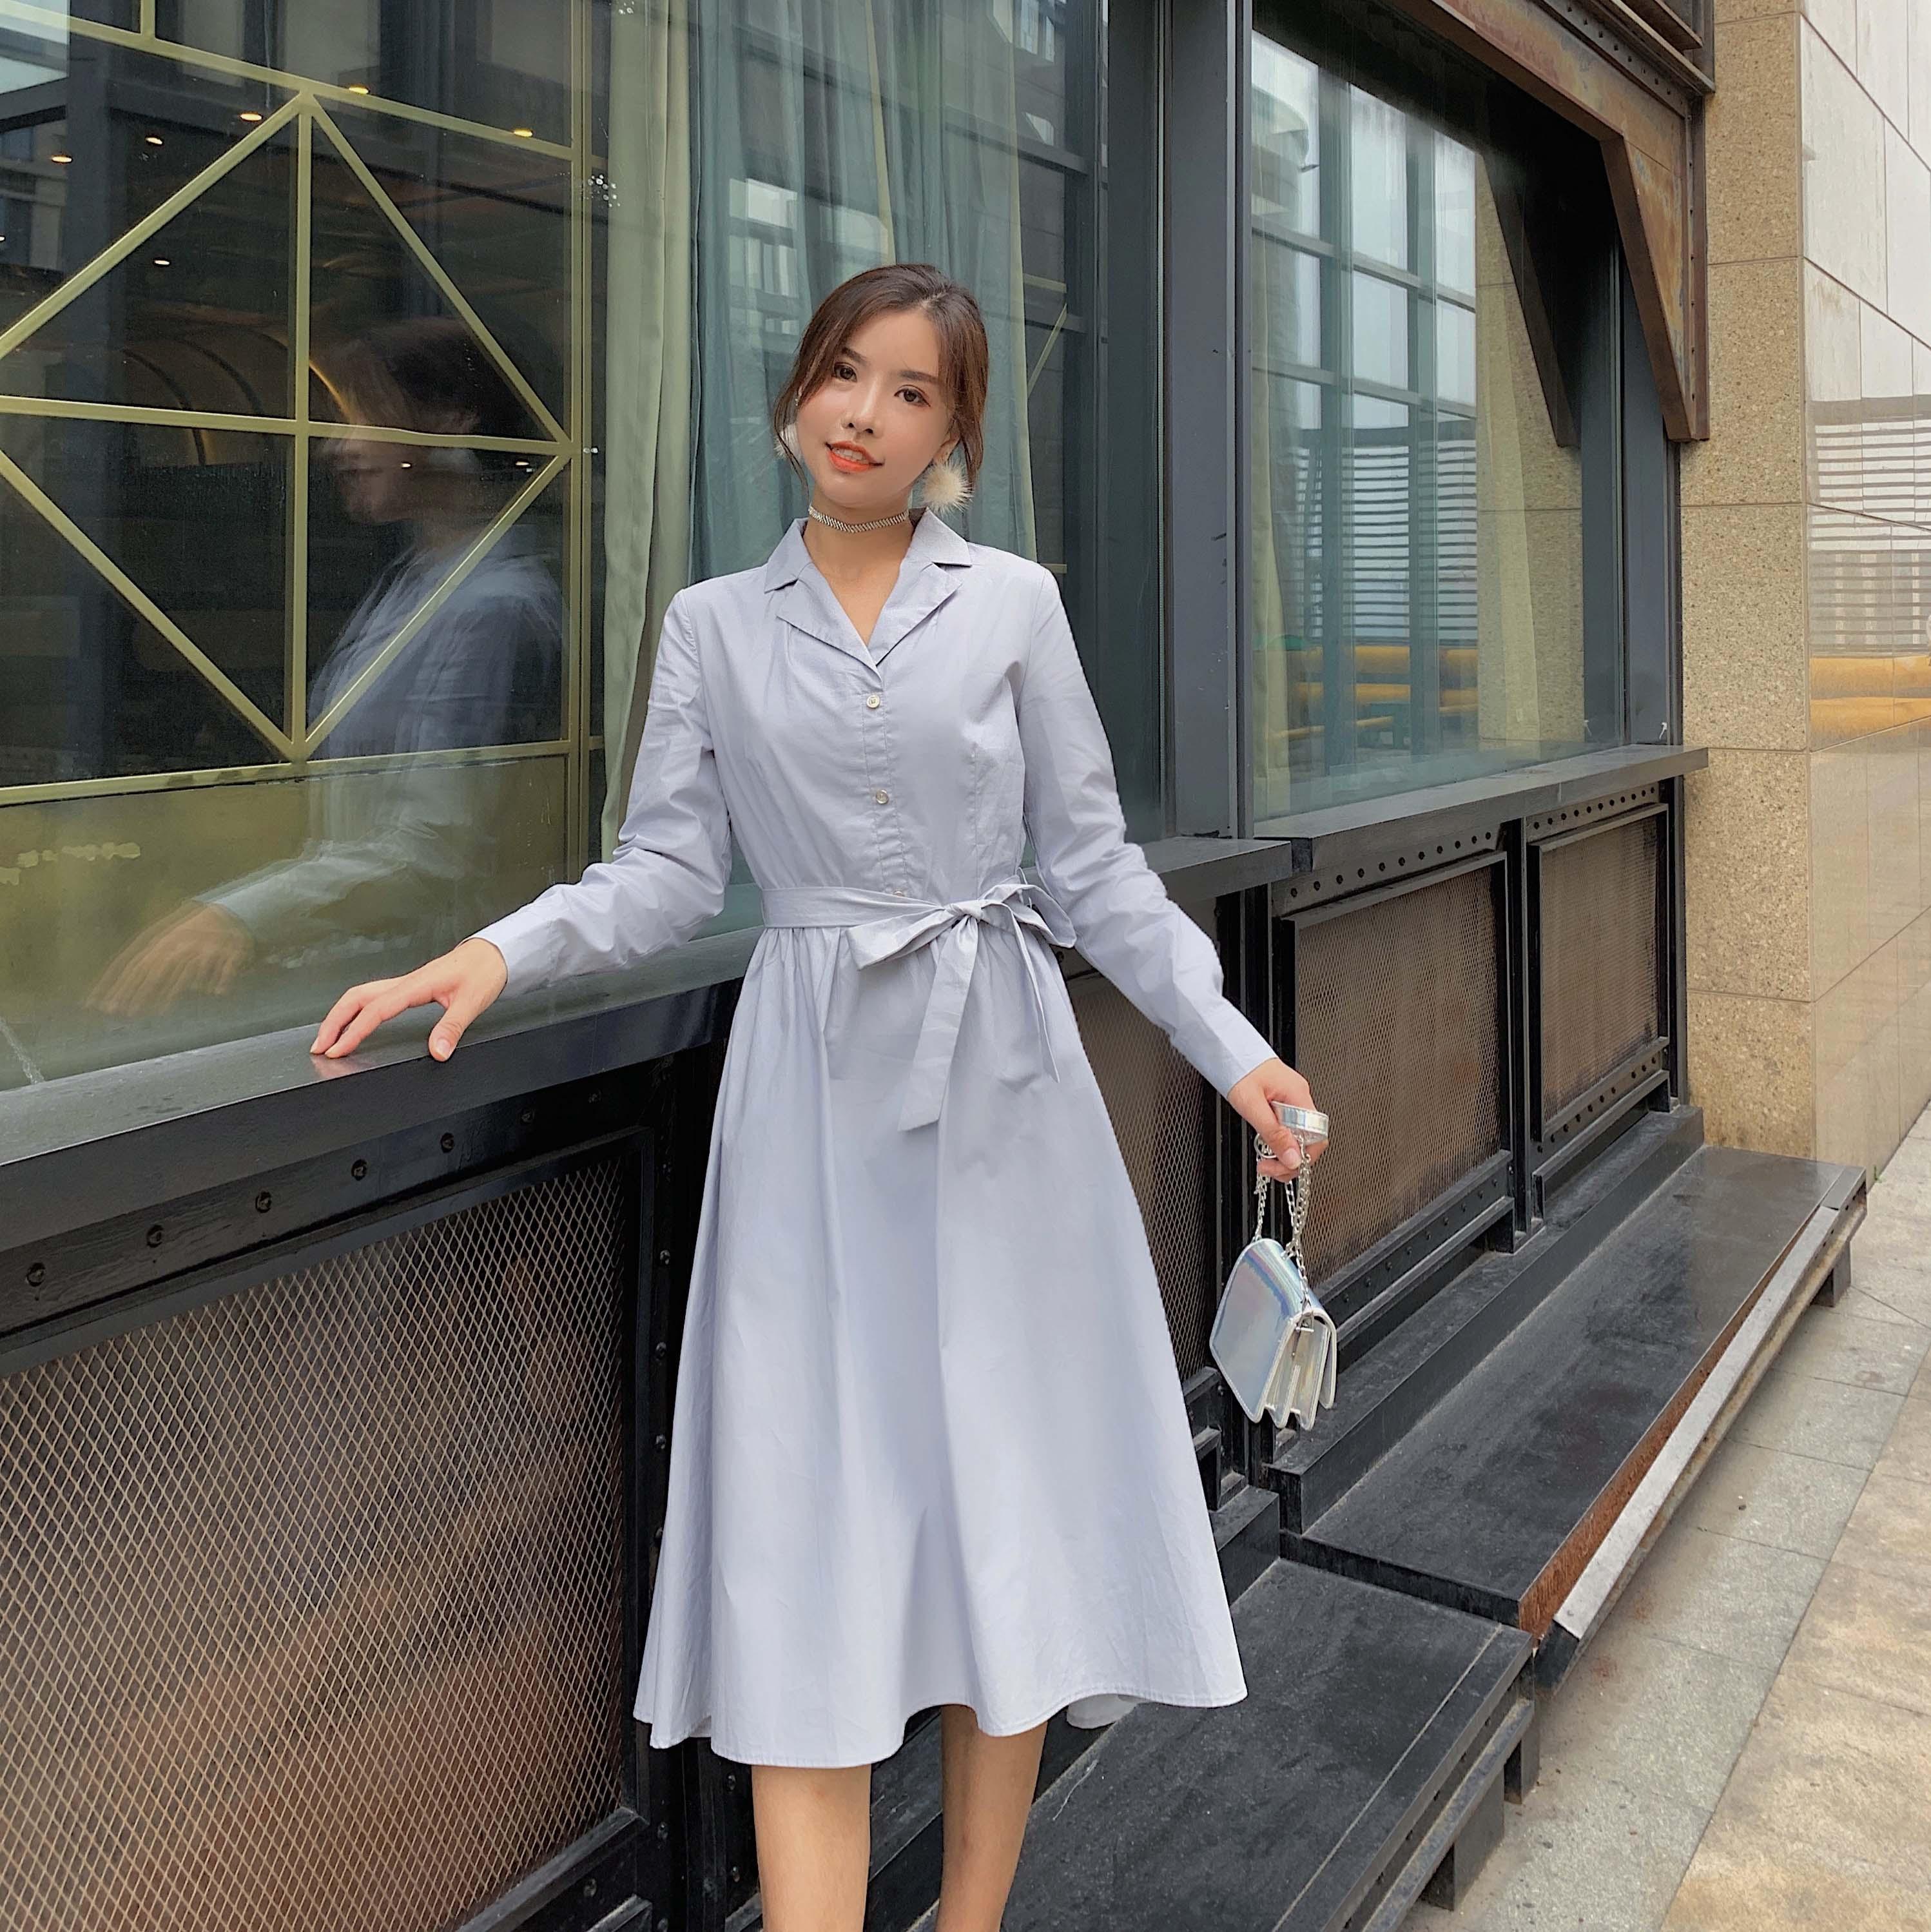 Hepburn 2020 new style long sleeve slim French retro dress fashion temperament show thin trend womens dress